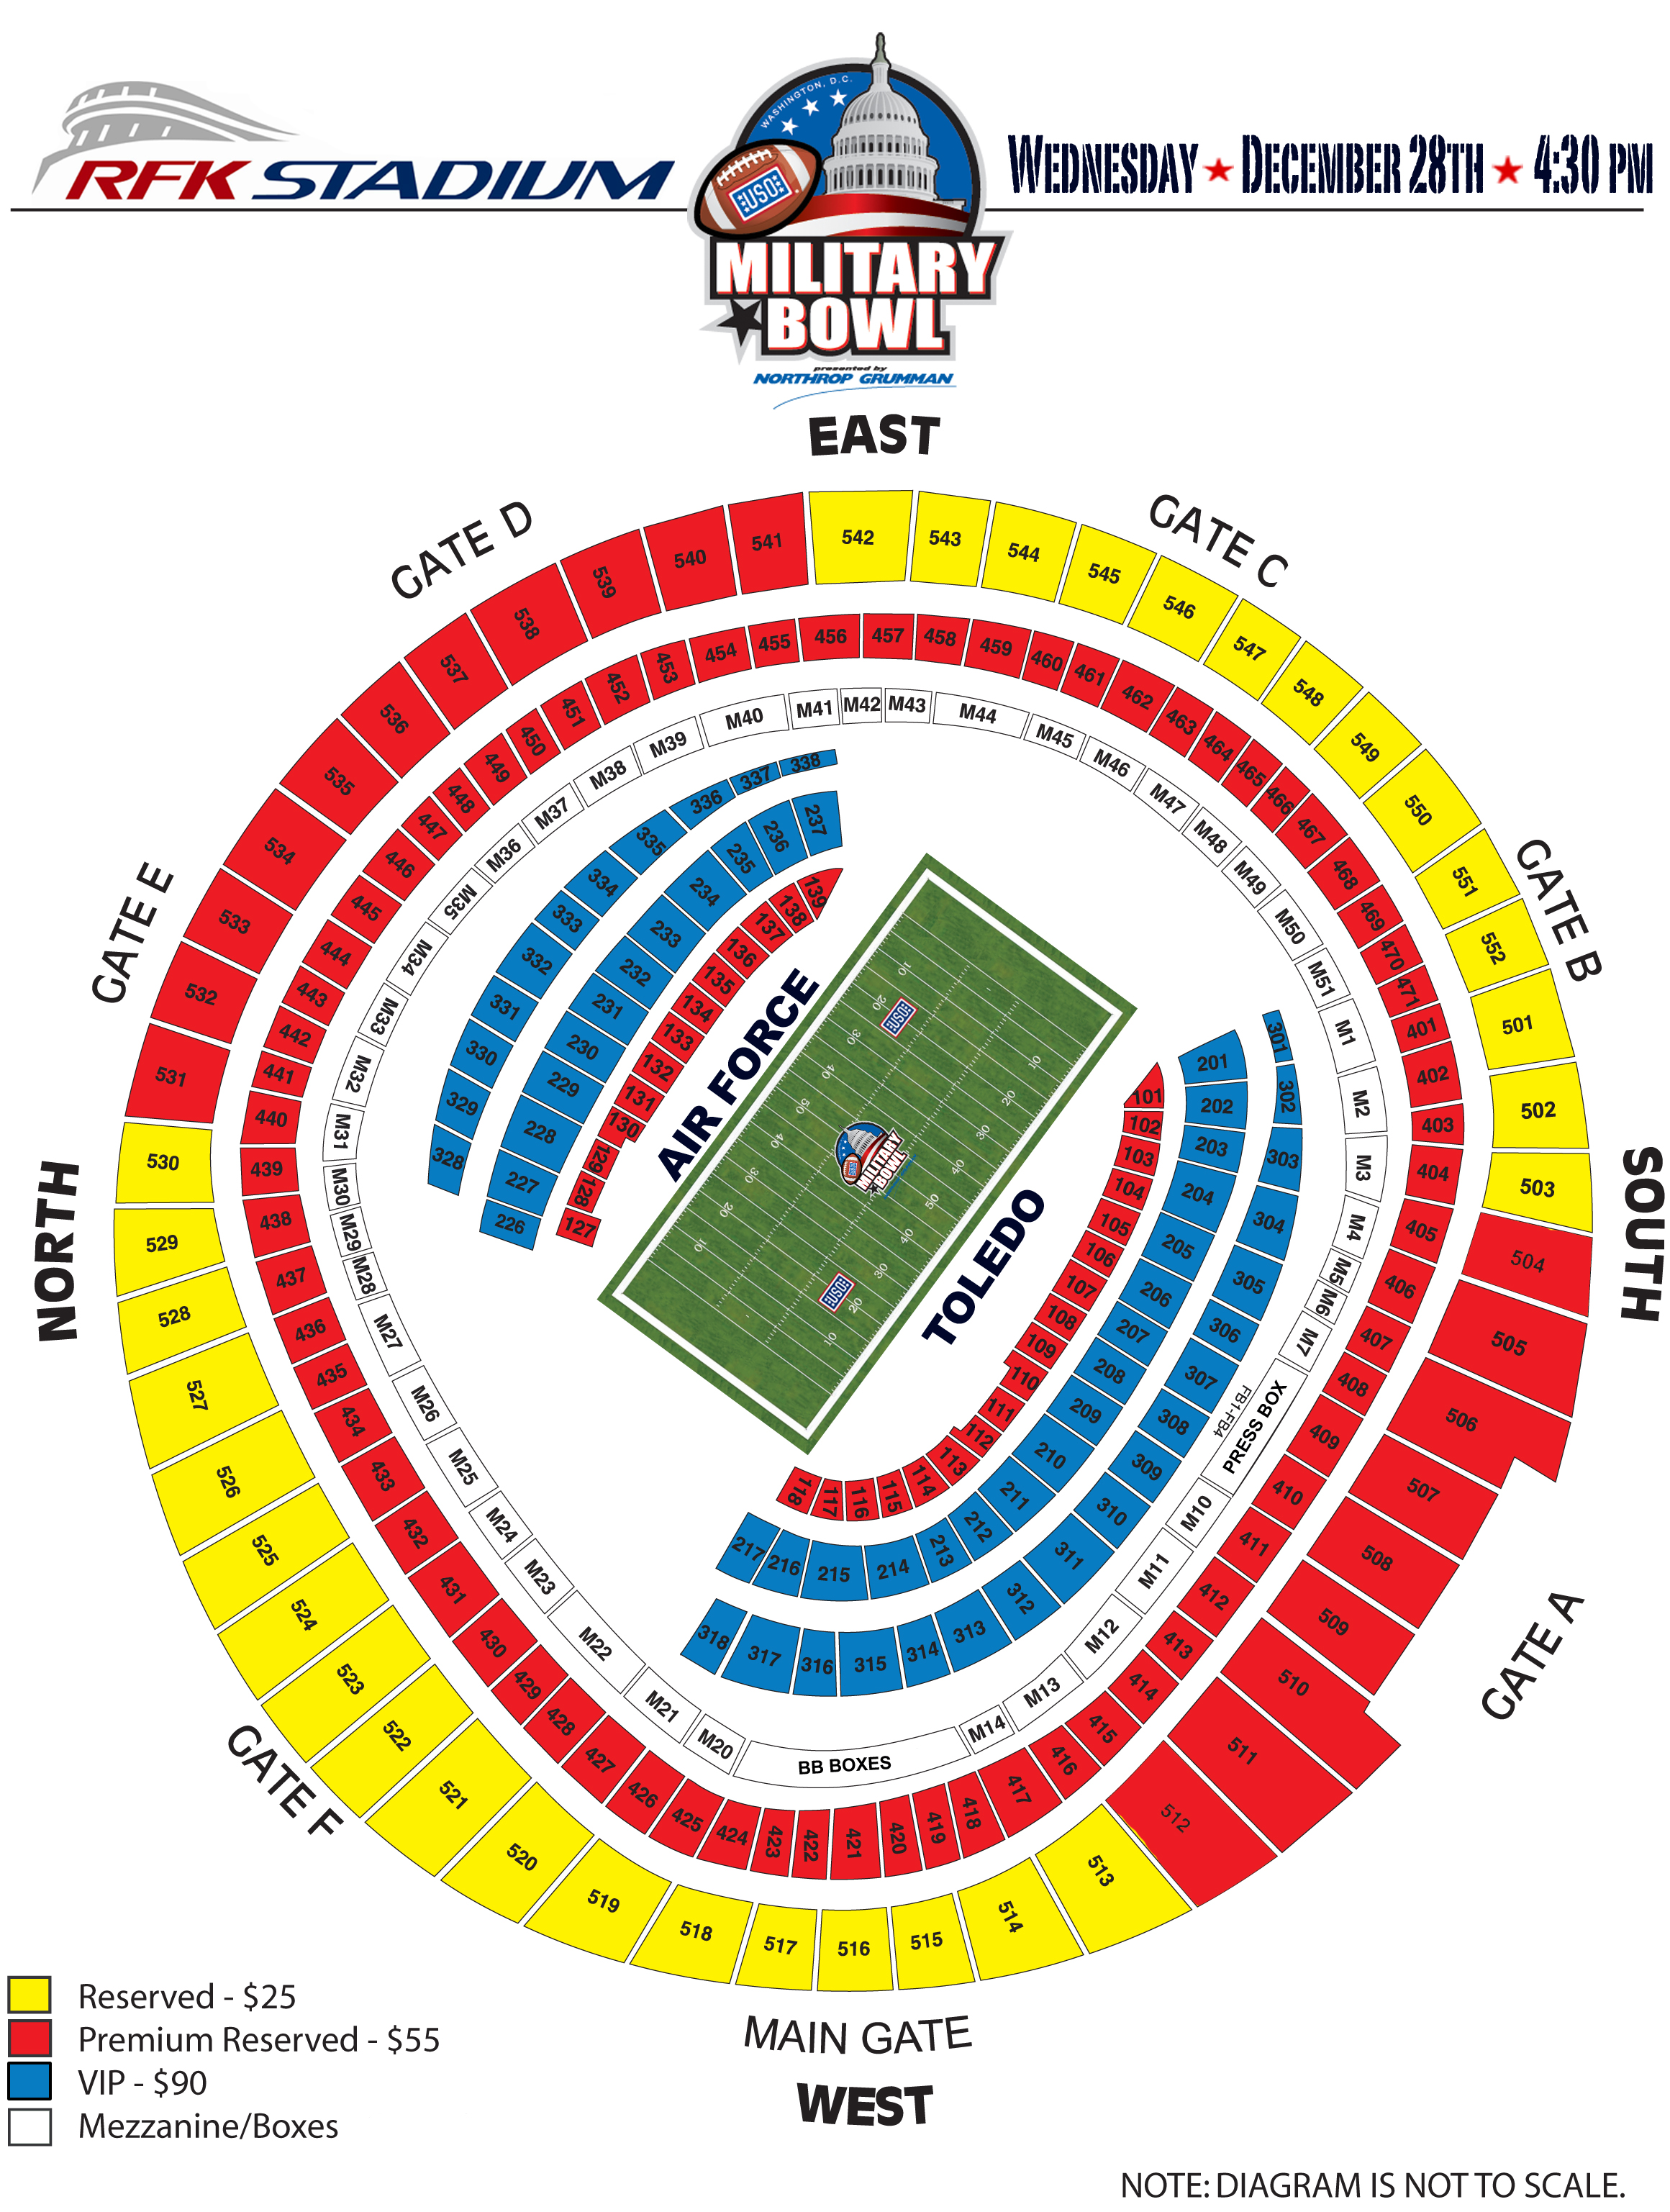 Rfk stadium seating chart heart impulsar co